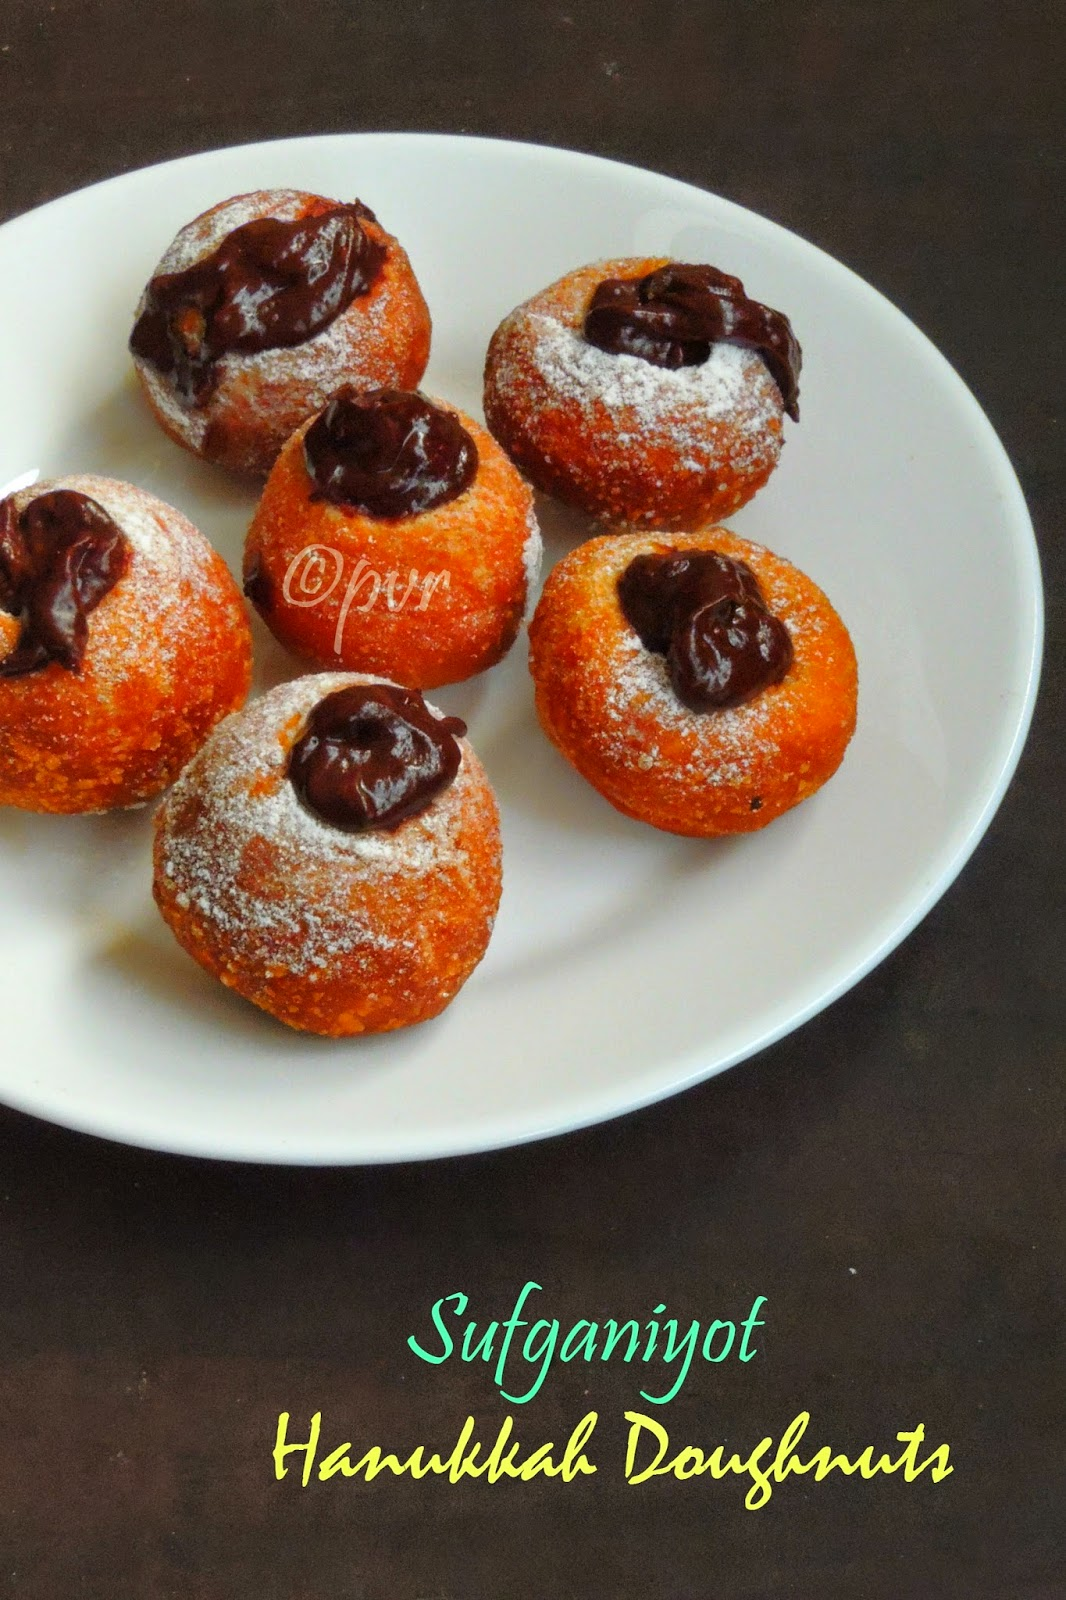 Hanukkah, Jelly Doughnuts, Sufganiyot